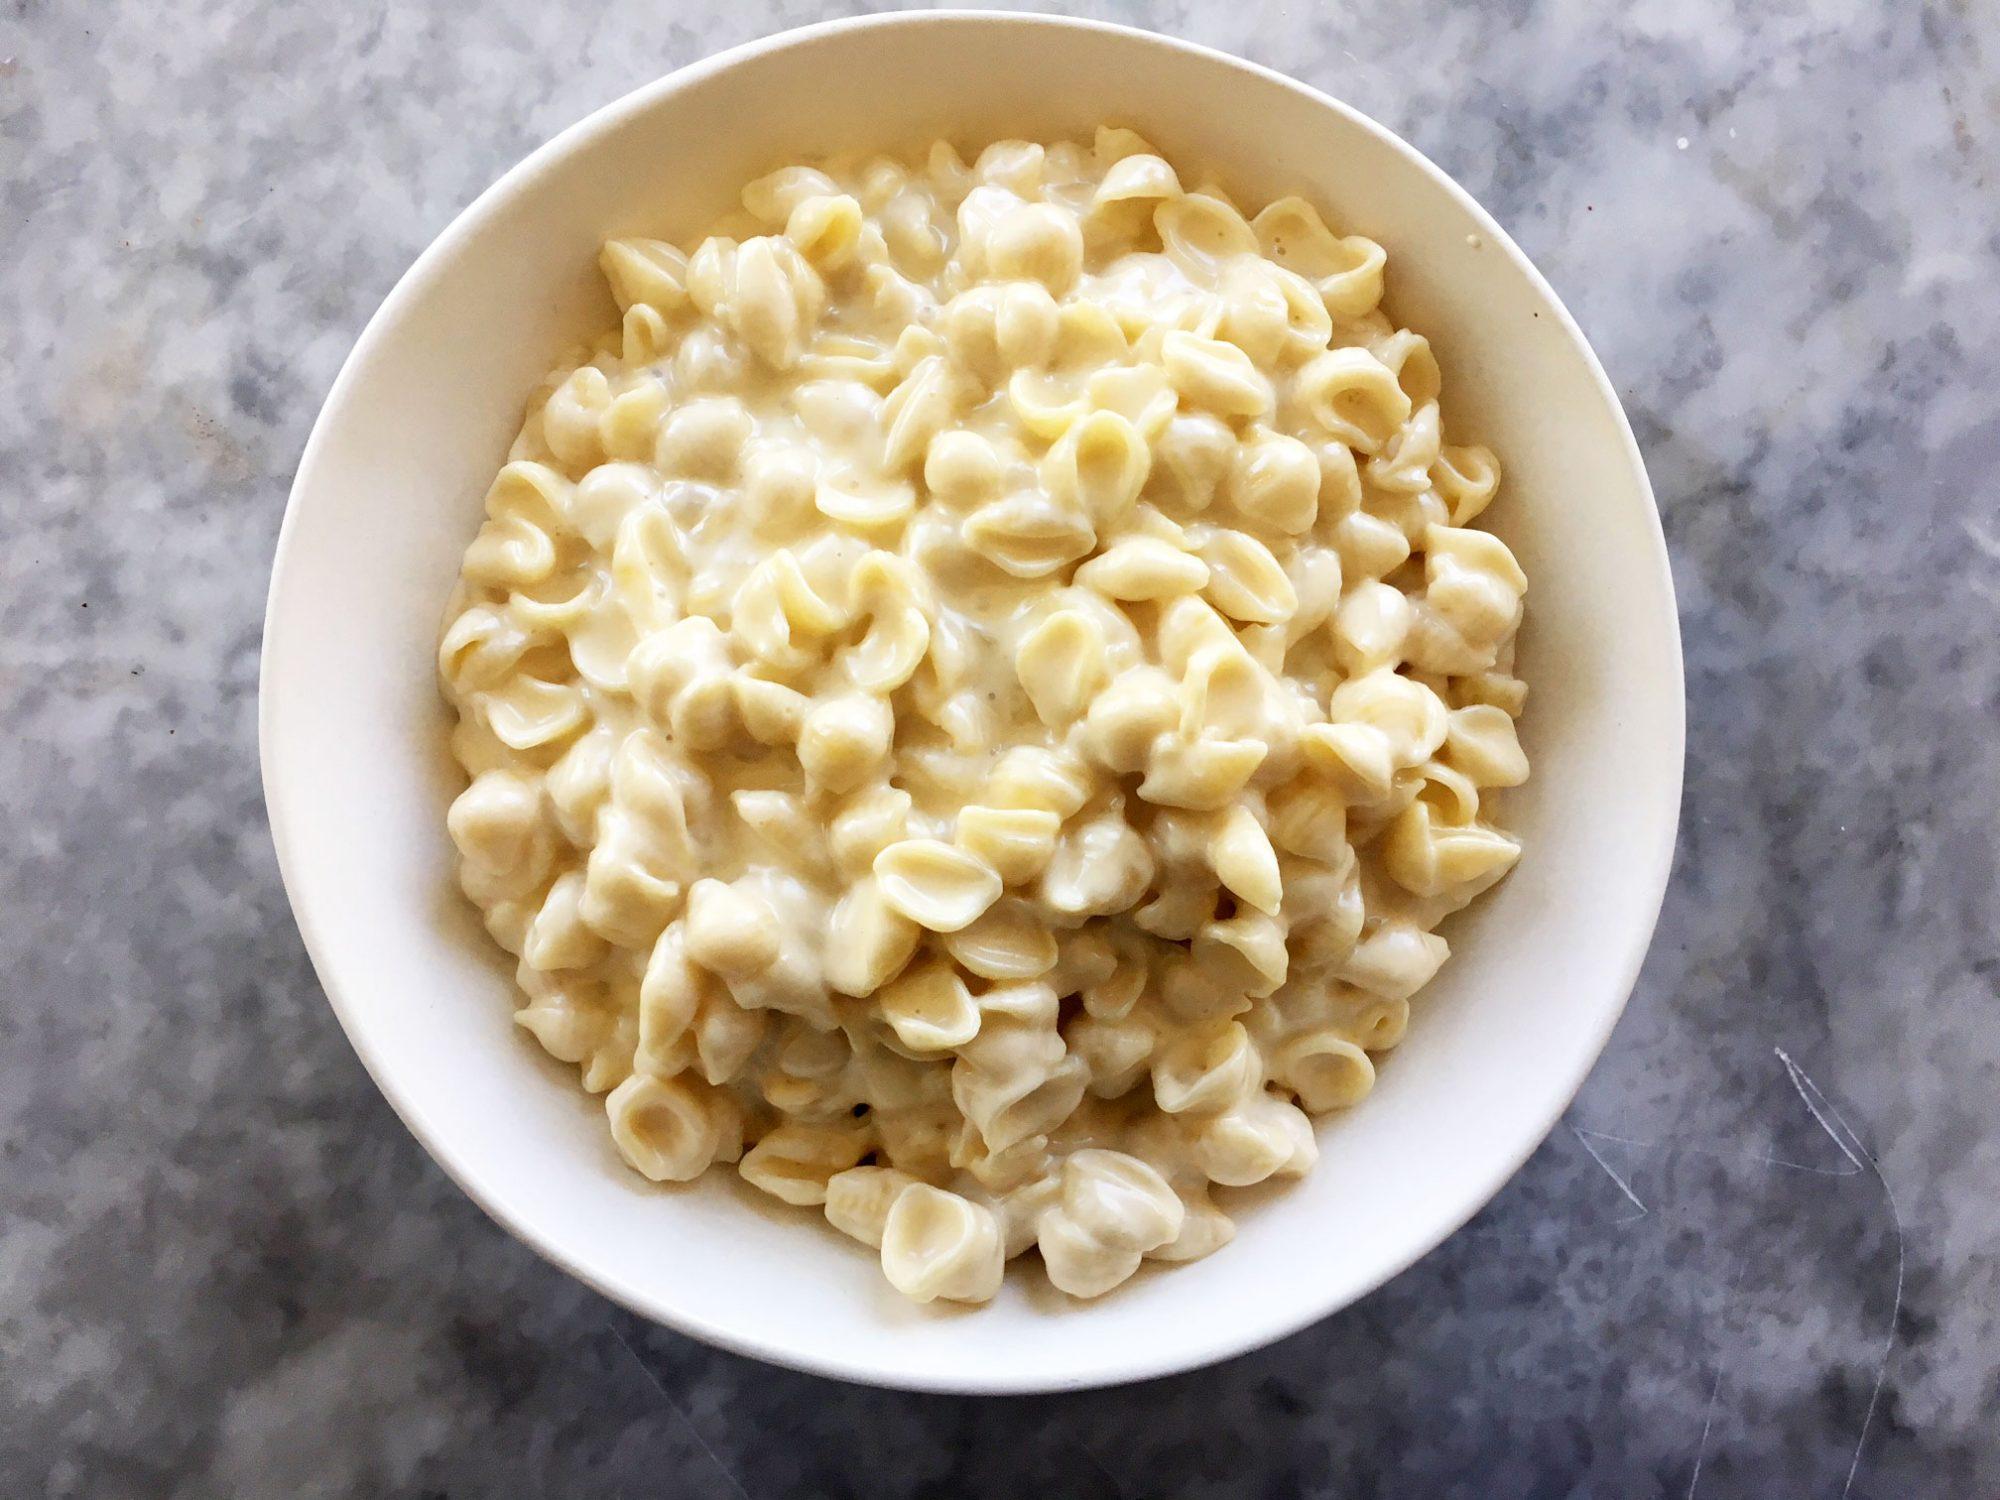 Copycat-Panera-Bread-Mac-and-Cheese-.jpg